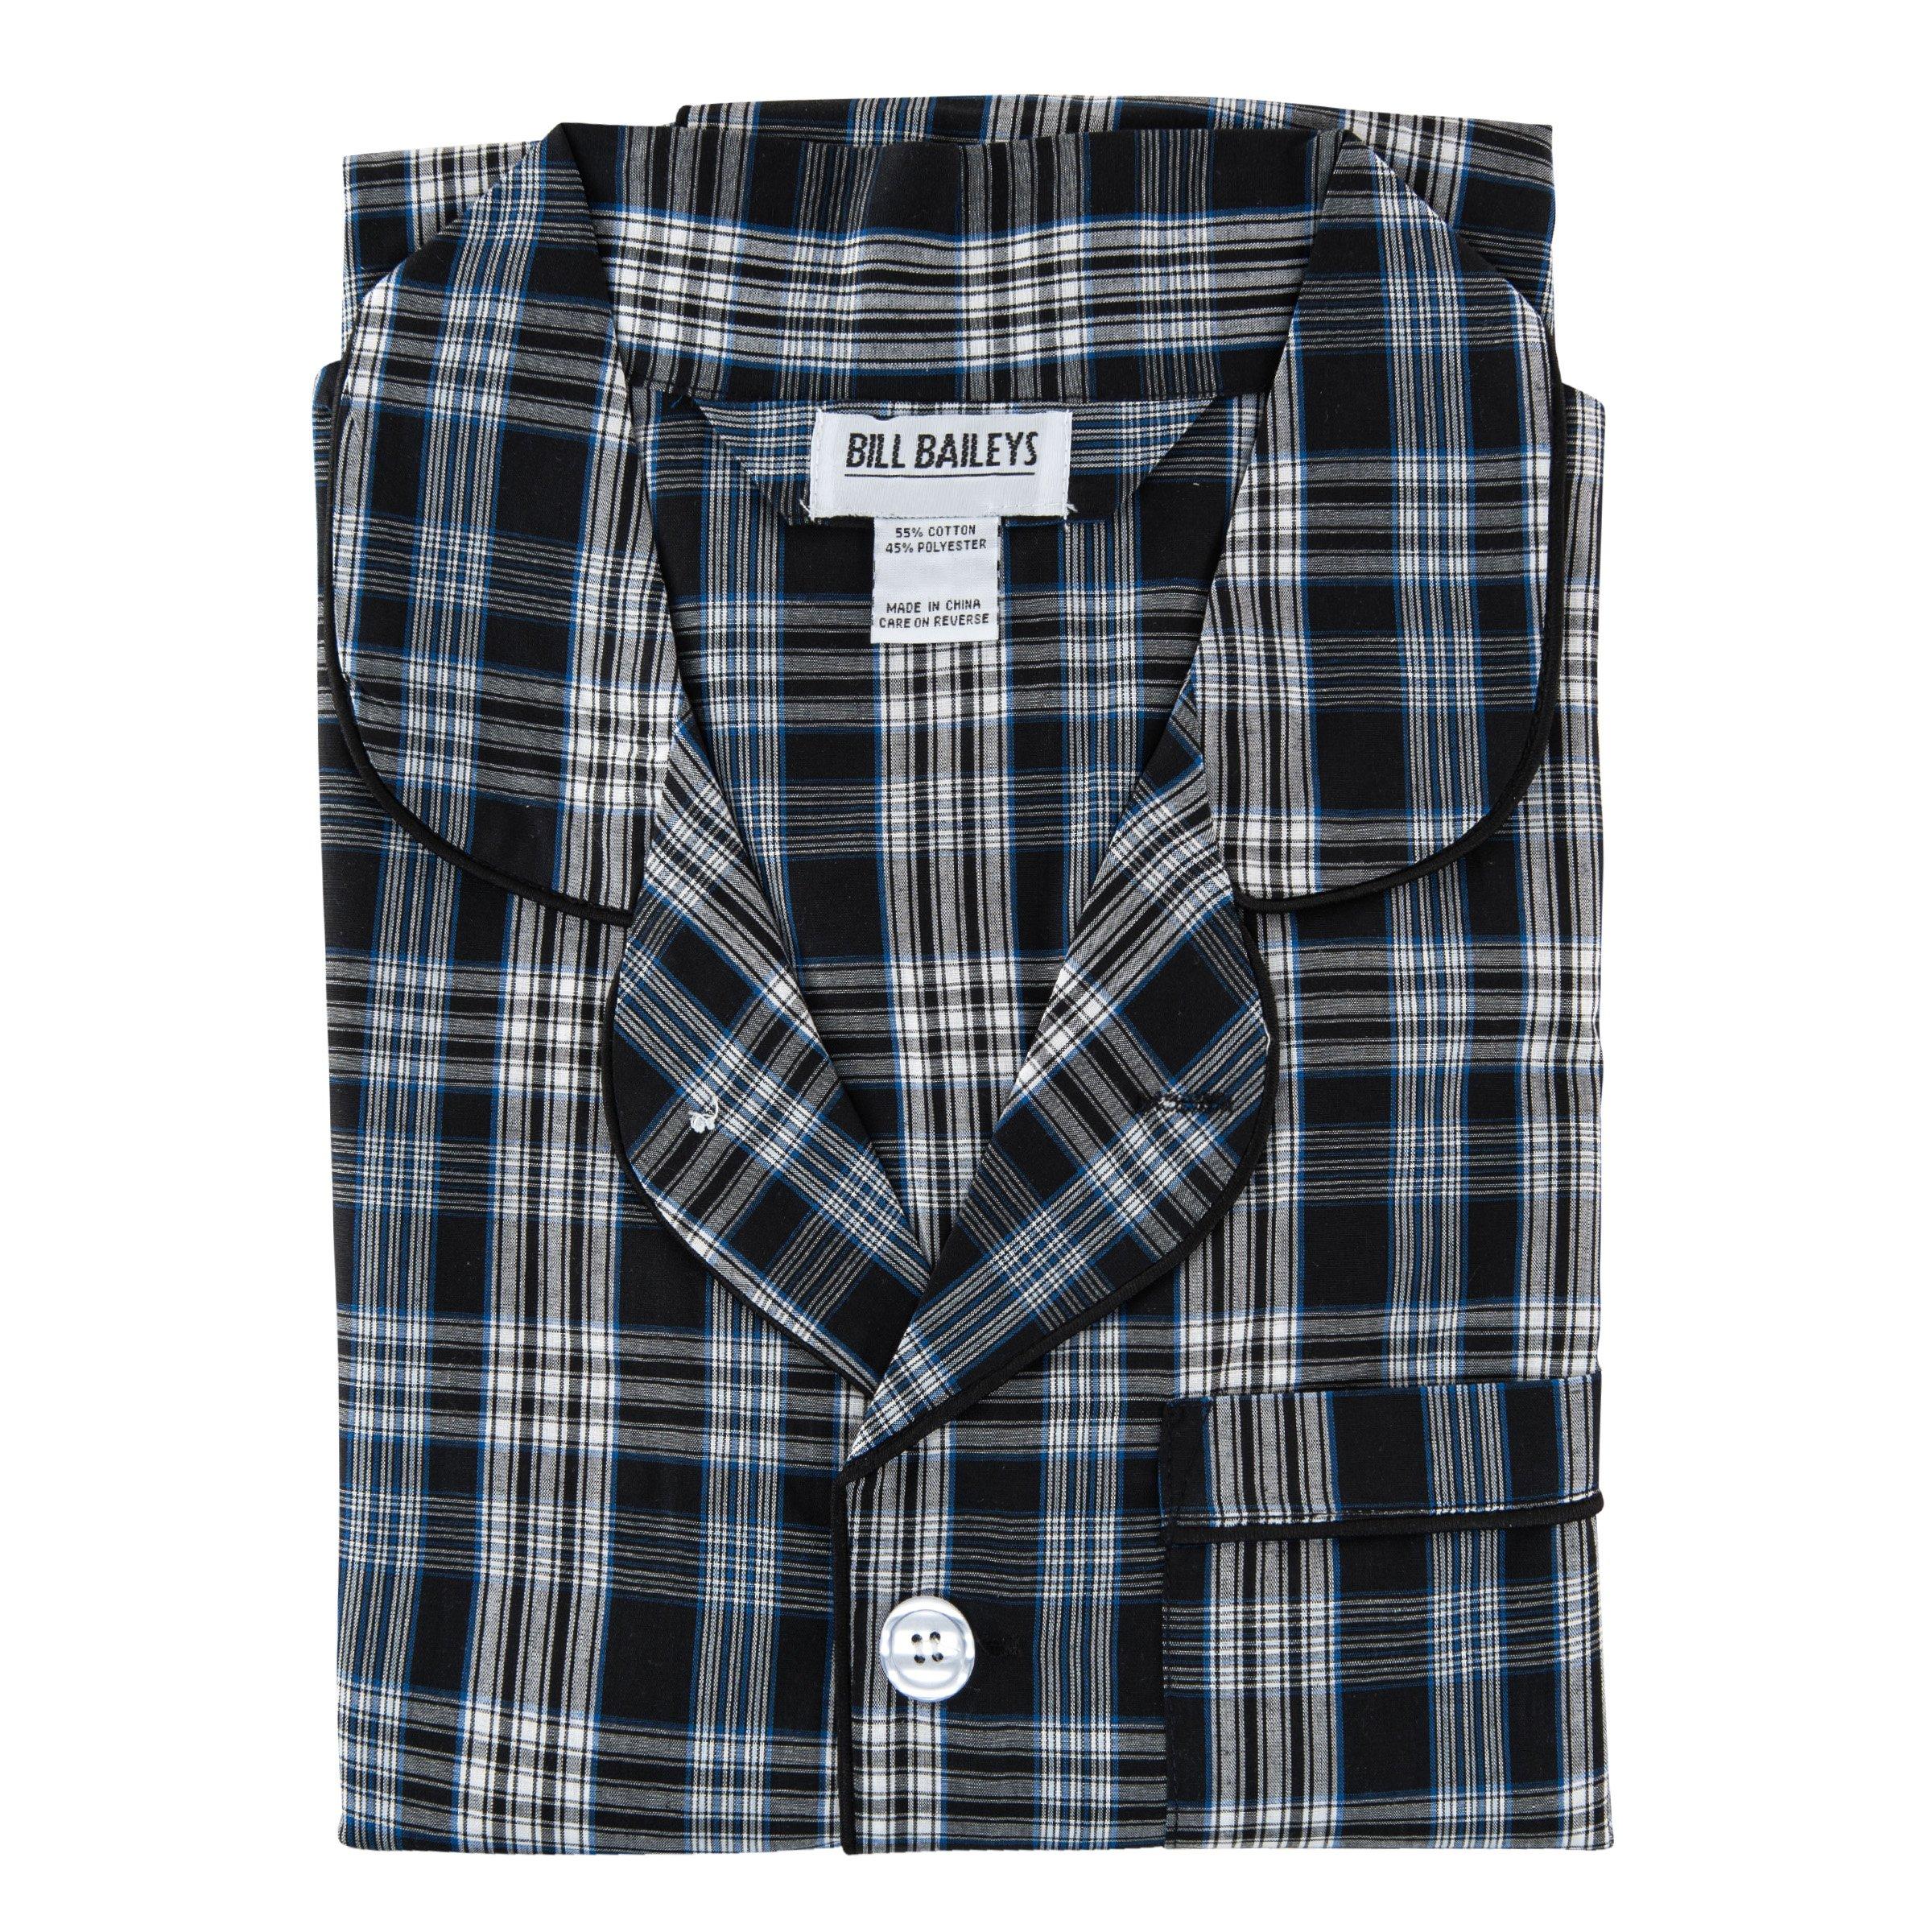 Bill Baileys Men's Long Woven Pajamas Set Button Front Down Long Sleeve Pajama (Large, Navy) by Bill Baileys